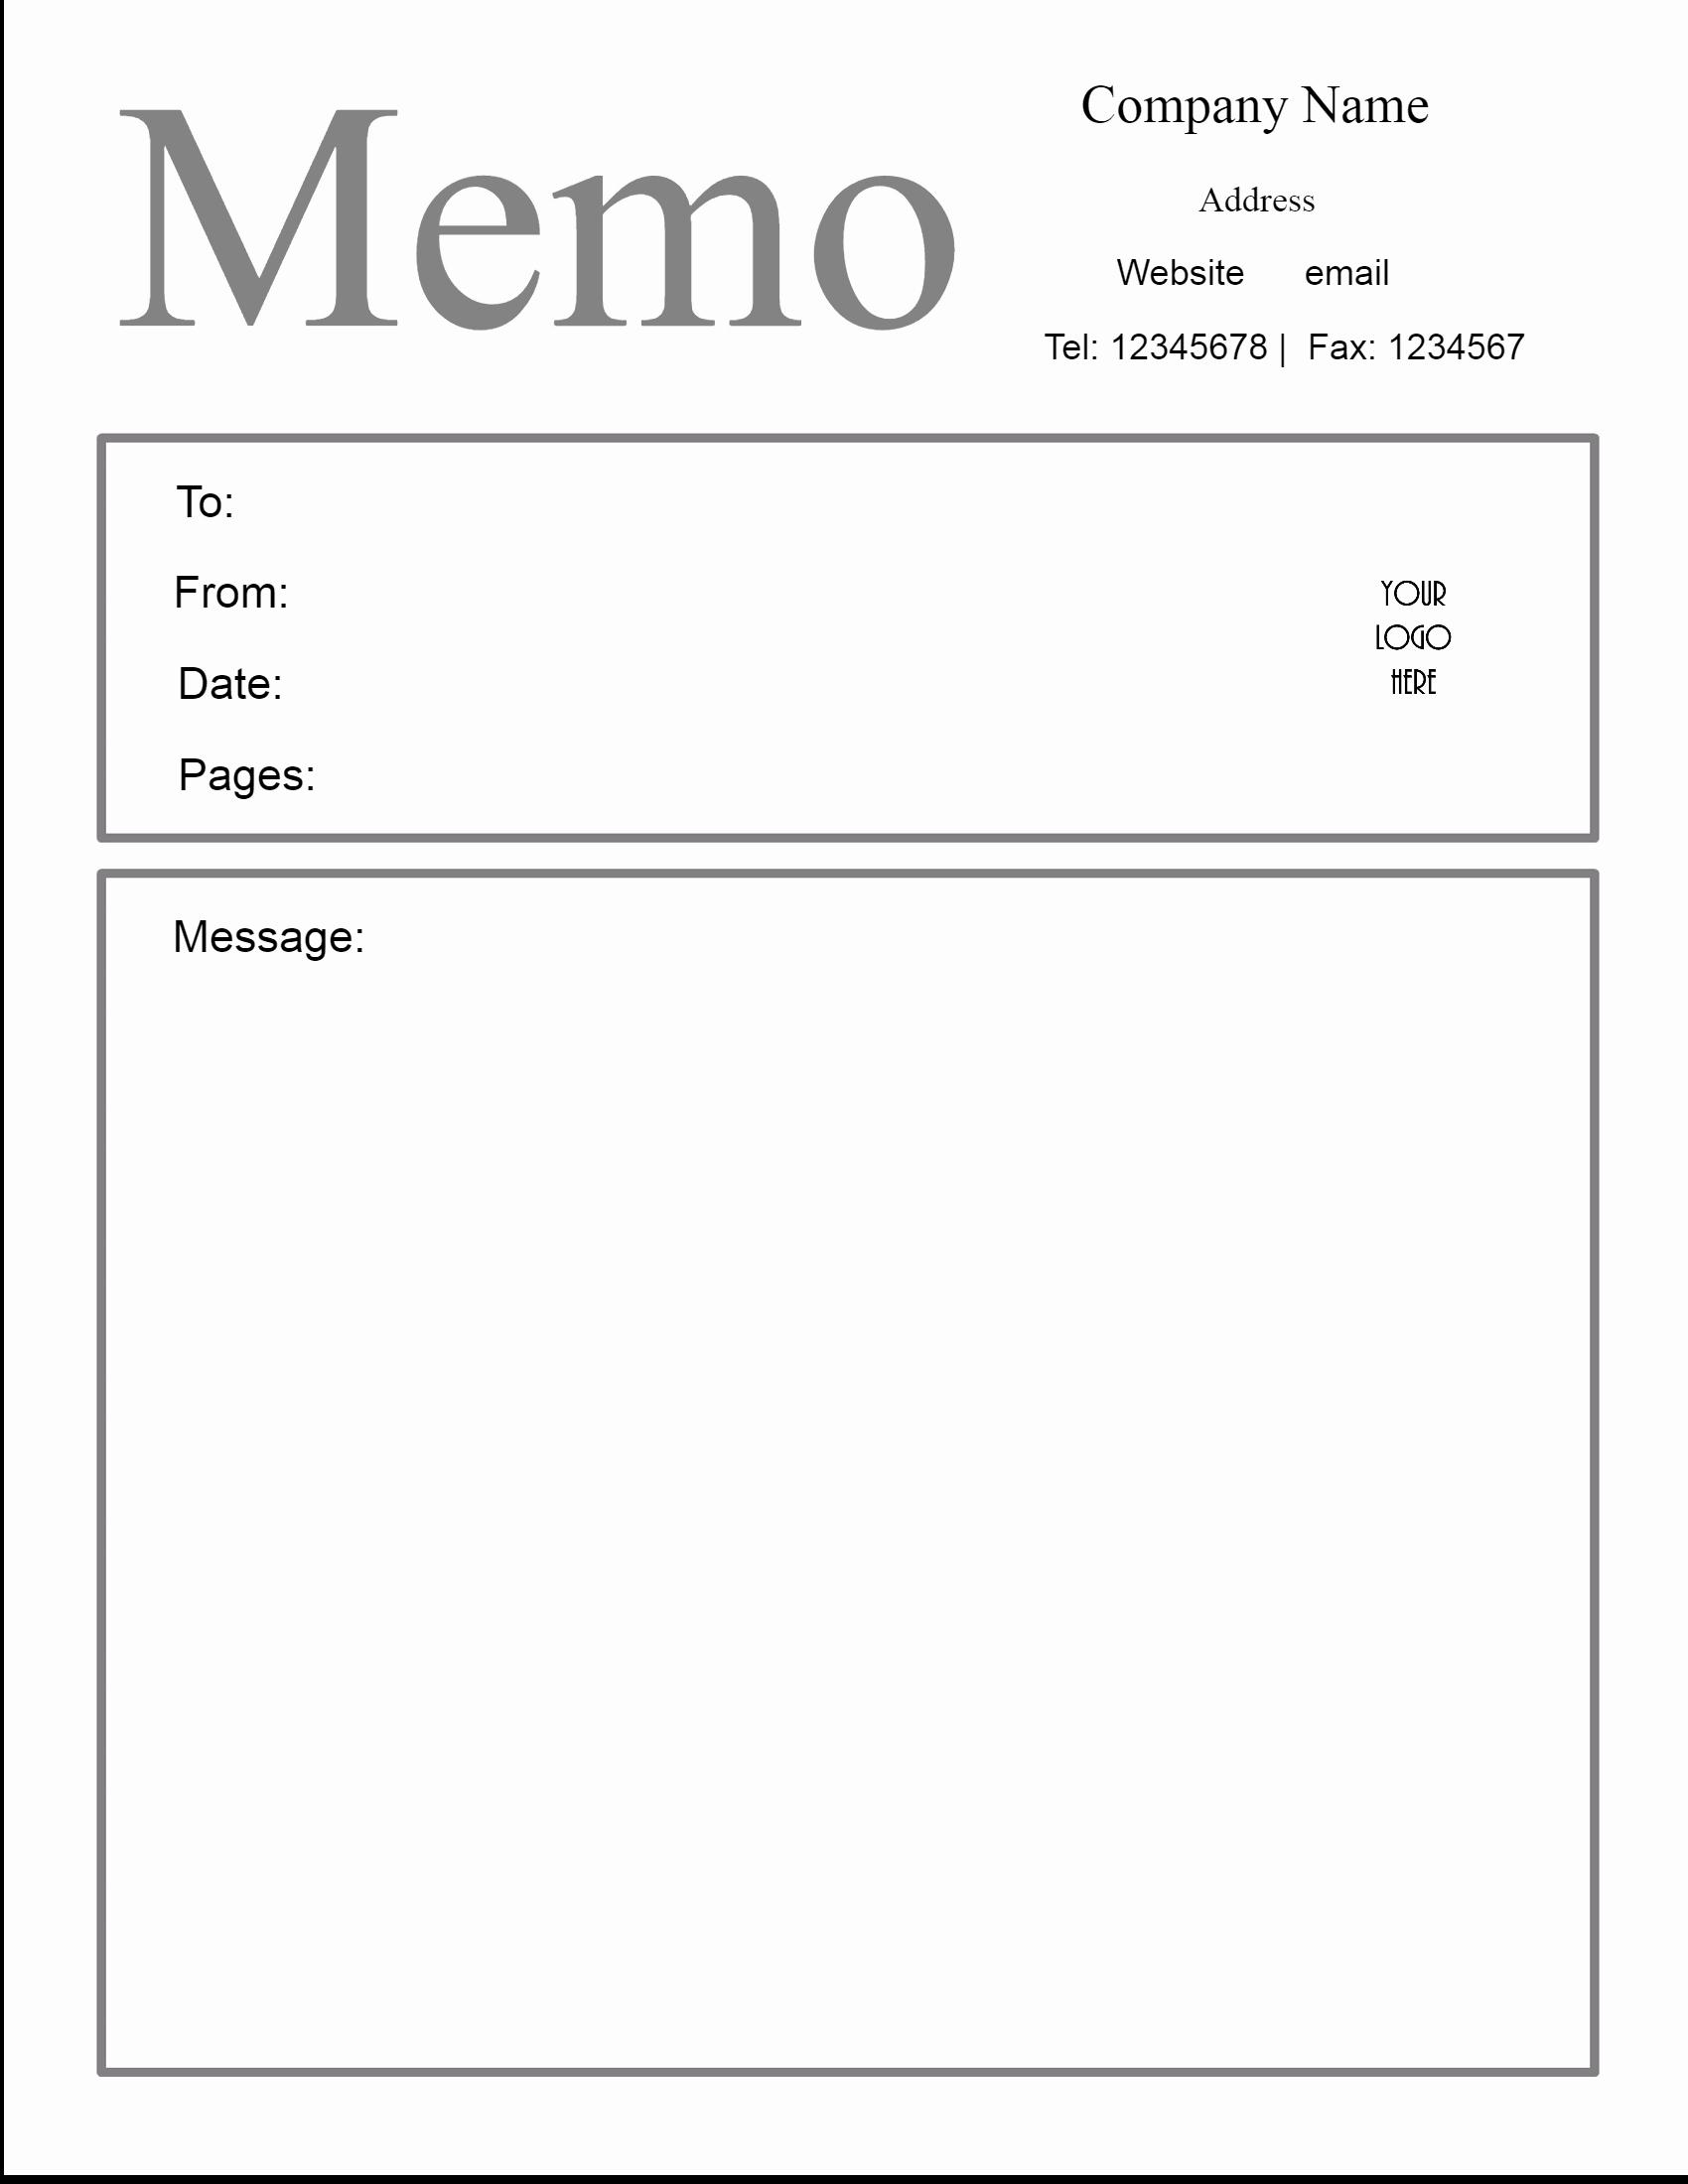 Ms Word Memo Templates Free Beautiful Free Microsoft Word Memo Template